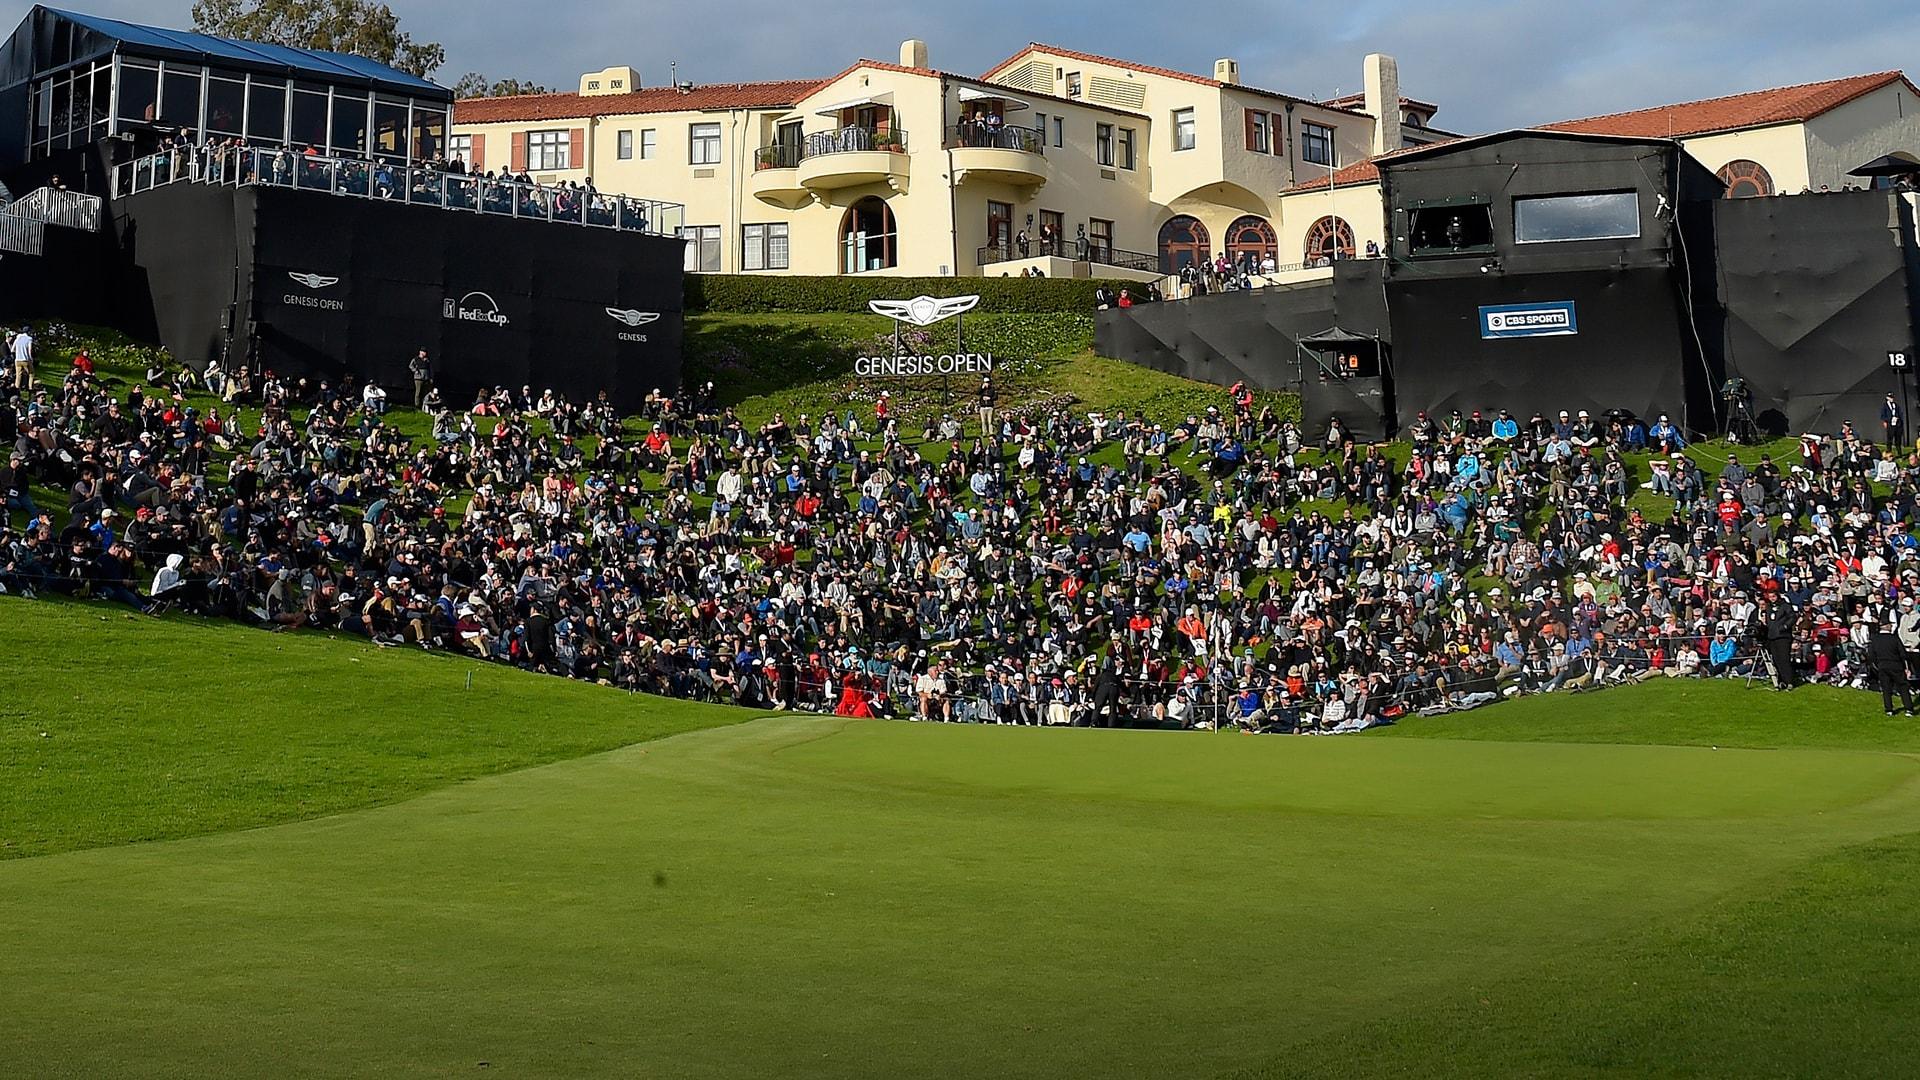 2019 Genesis Open: Tee times, TV schedule, stats   Golf Channel